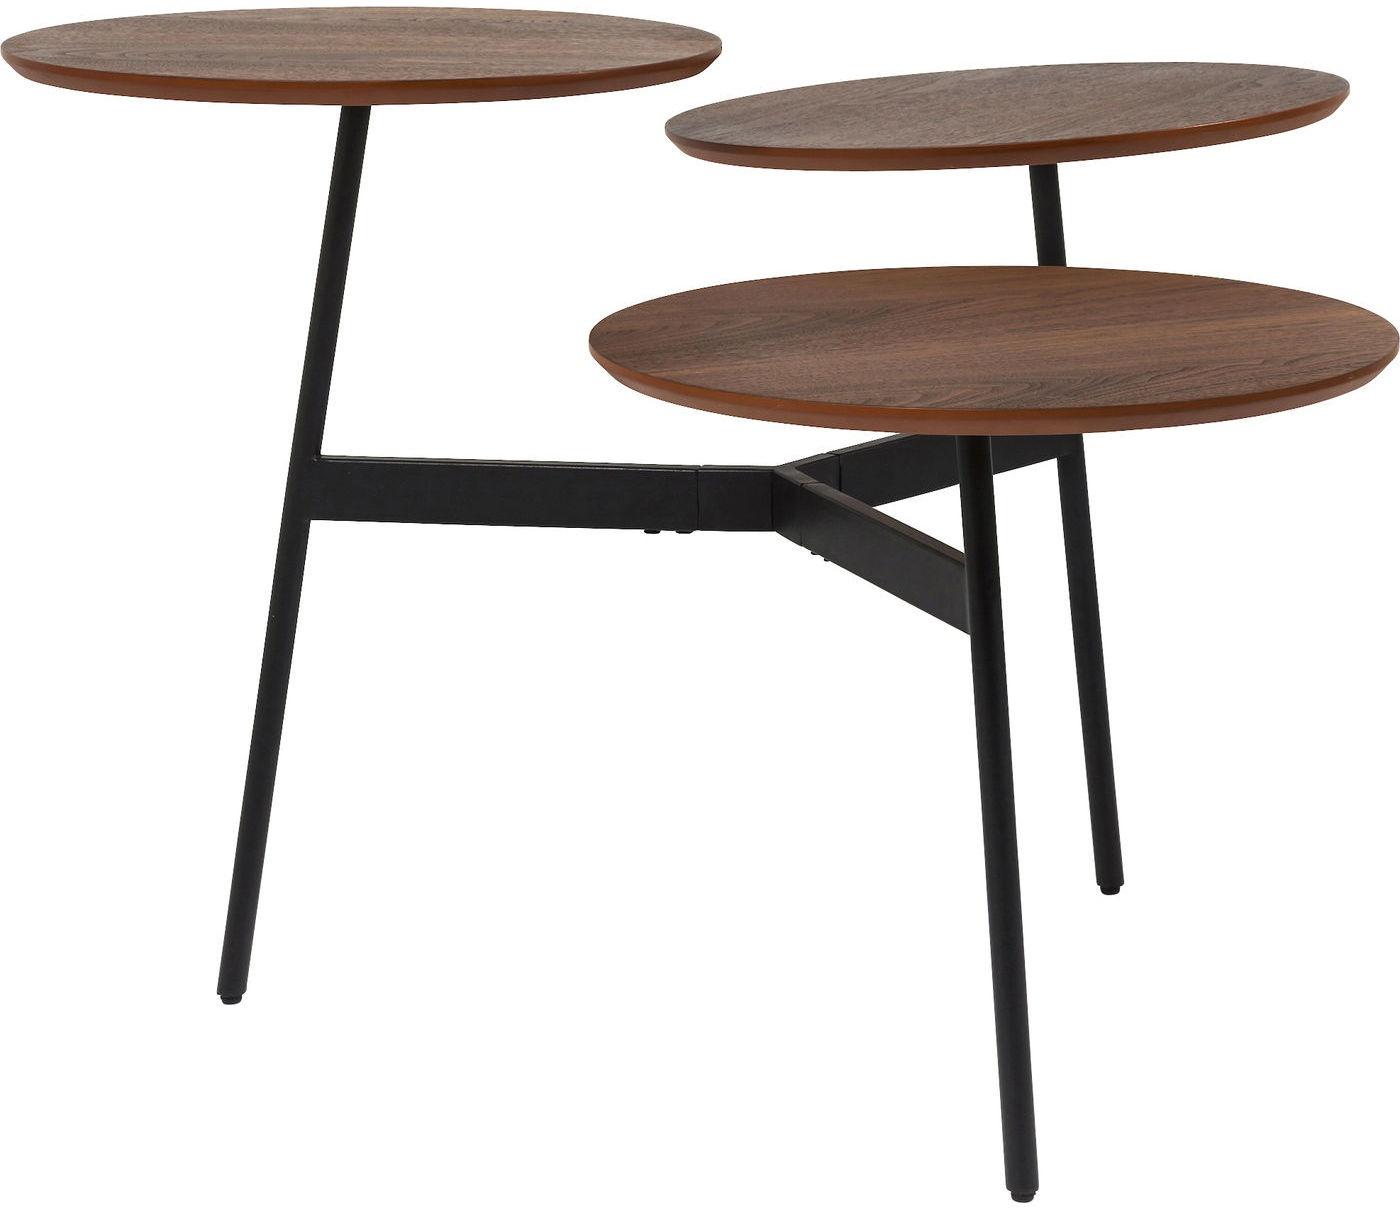 Kare Design Salontafel Bonsai Trio L95 X B89 X H60 Cm Hout Bruin kopen